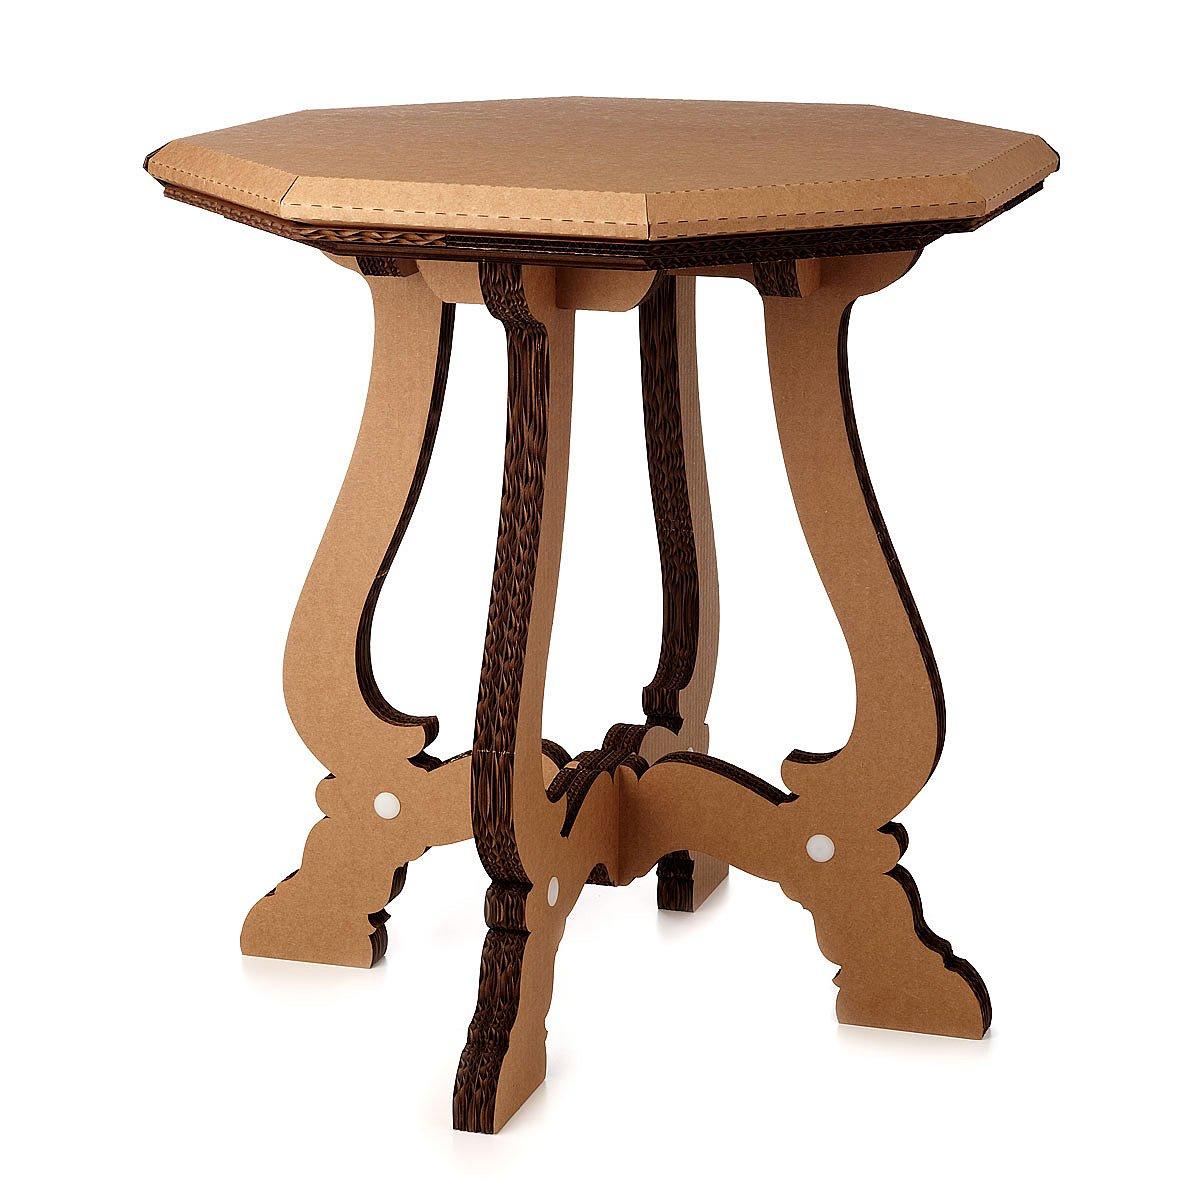 Diy cardboard furniture - Cardboard Table 1 Thumbnail